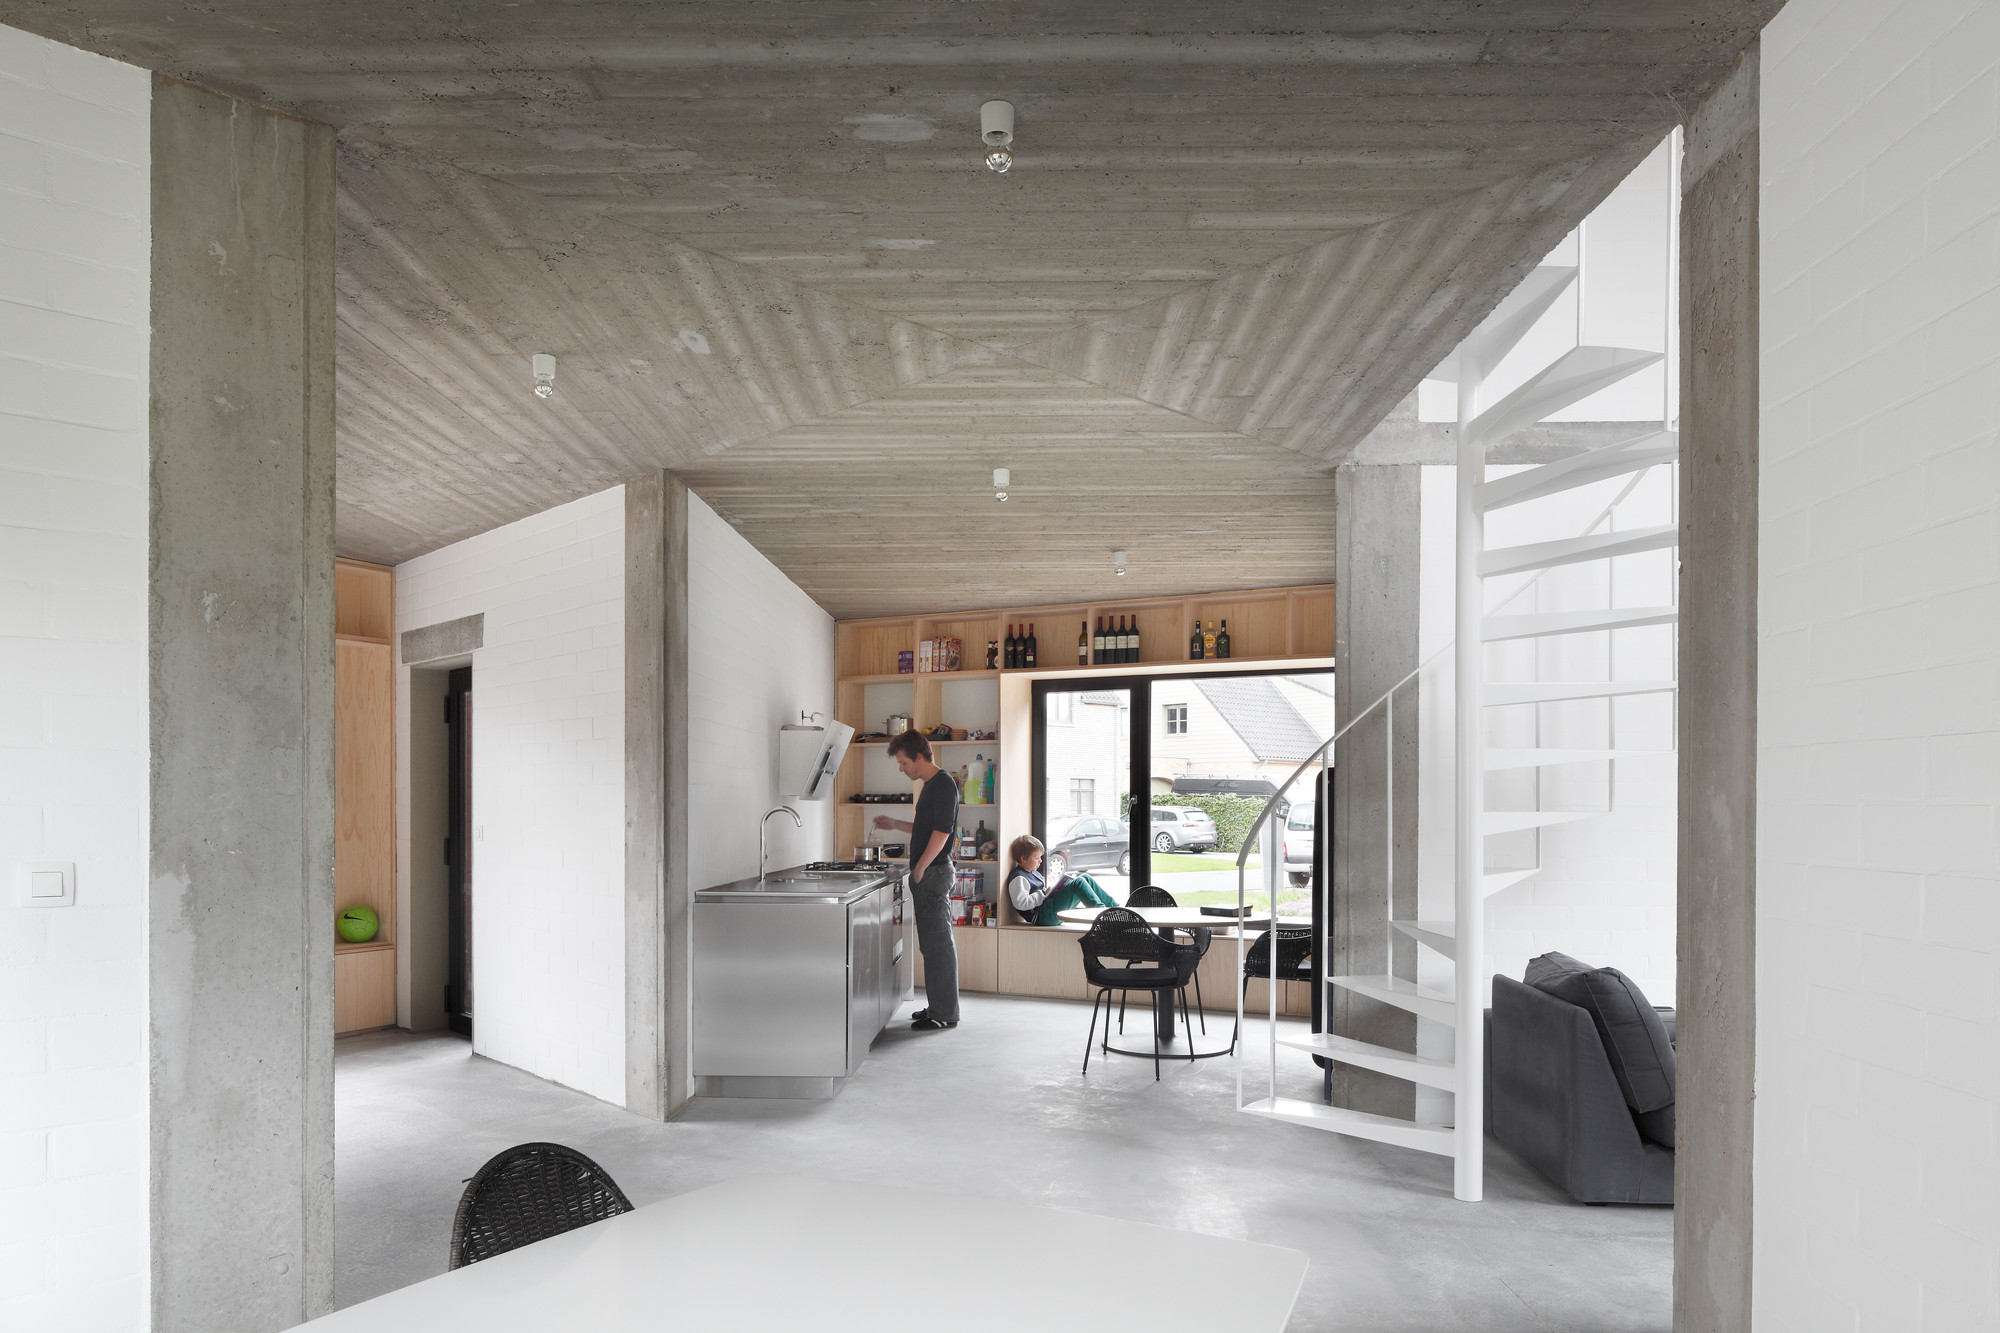 woning boW te Wondelgem / BLAF Architecten, © Stijn Bollaert